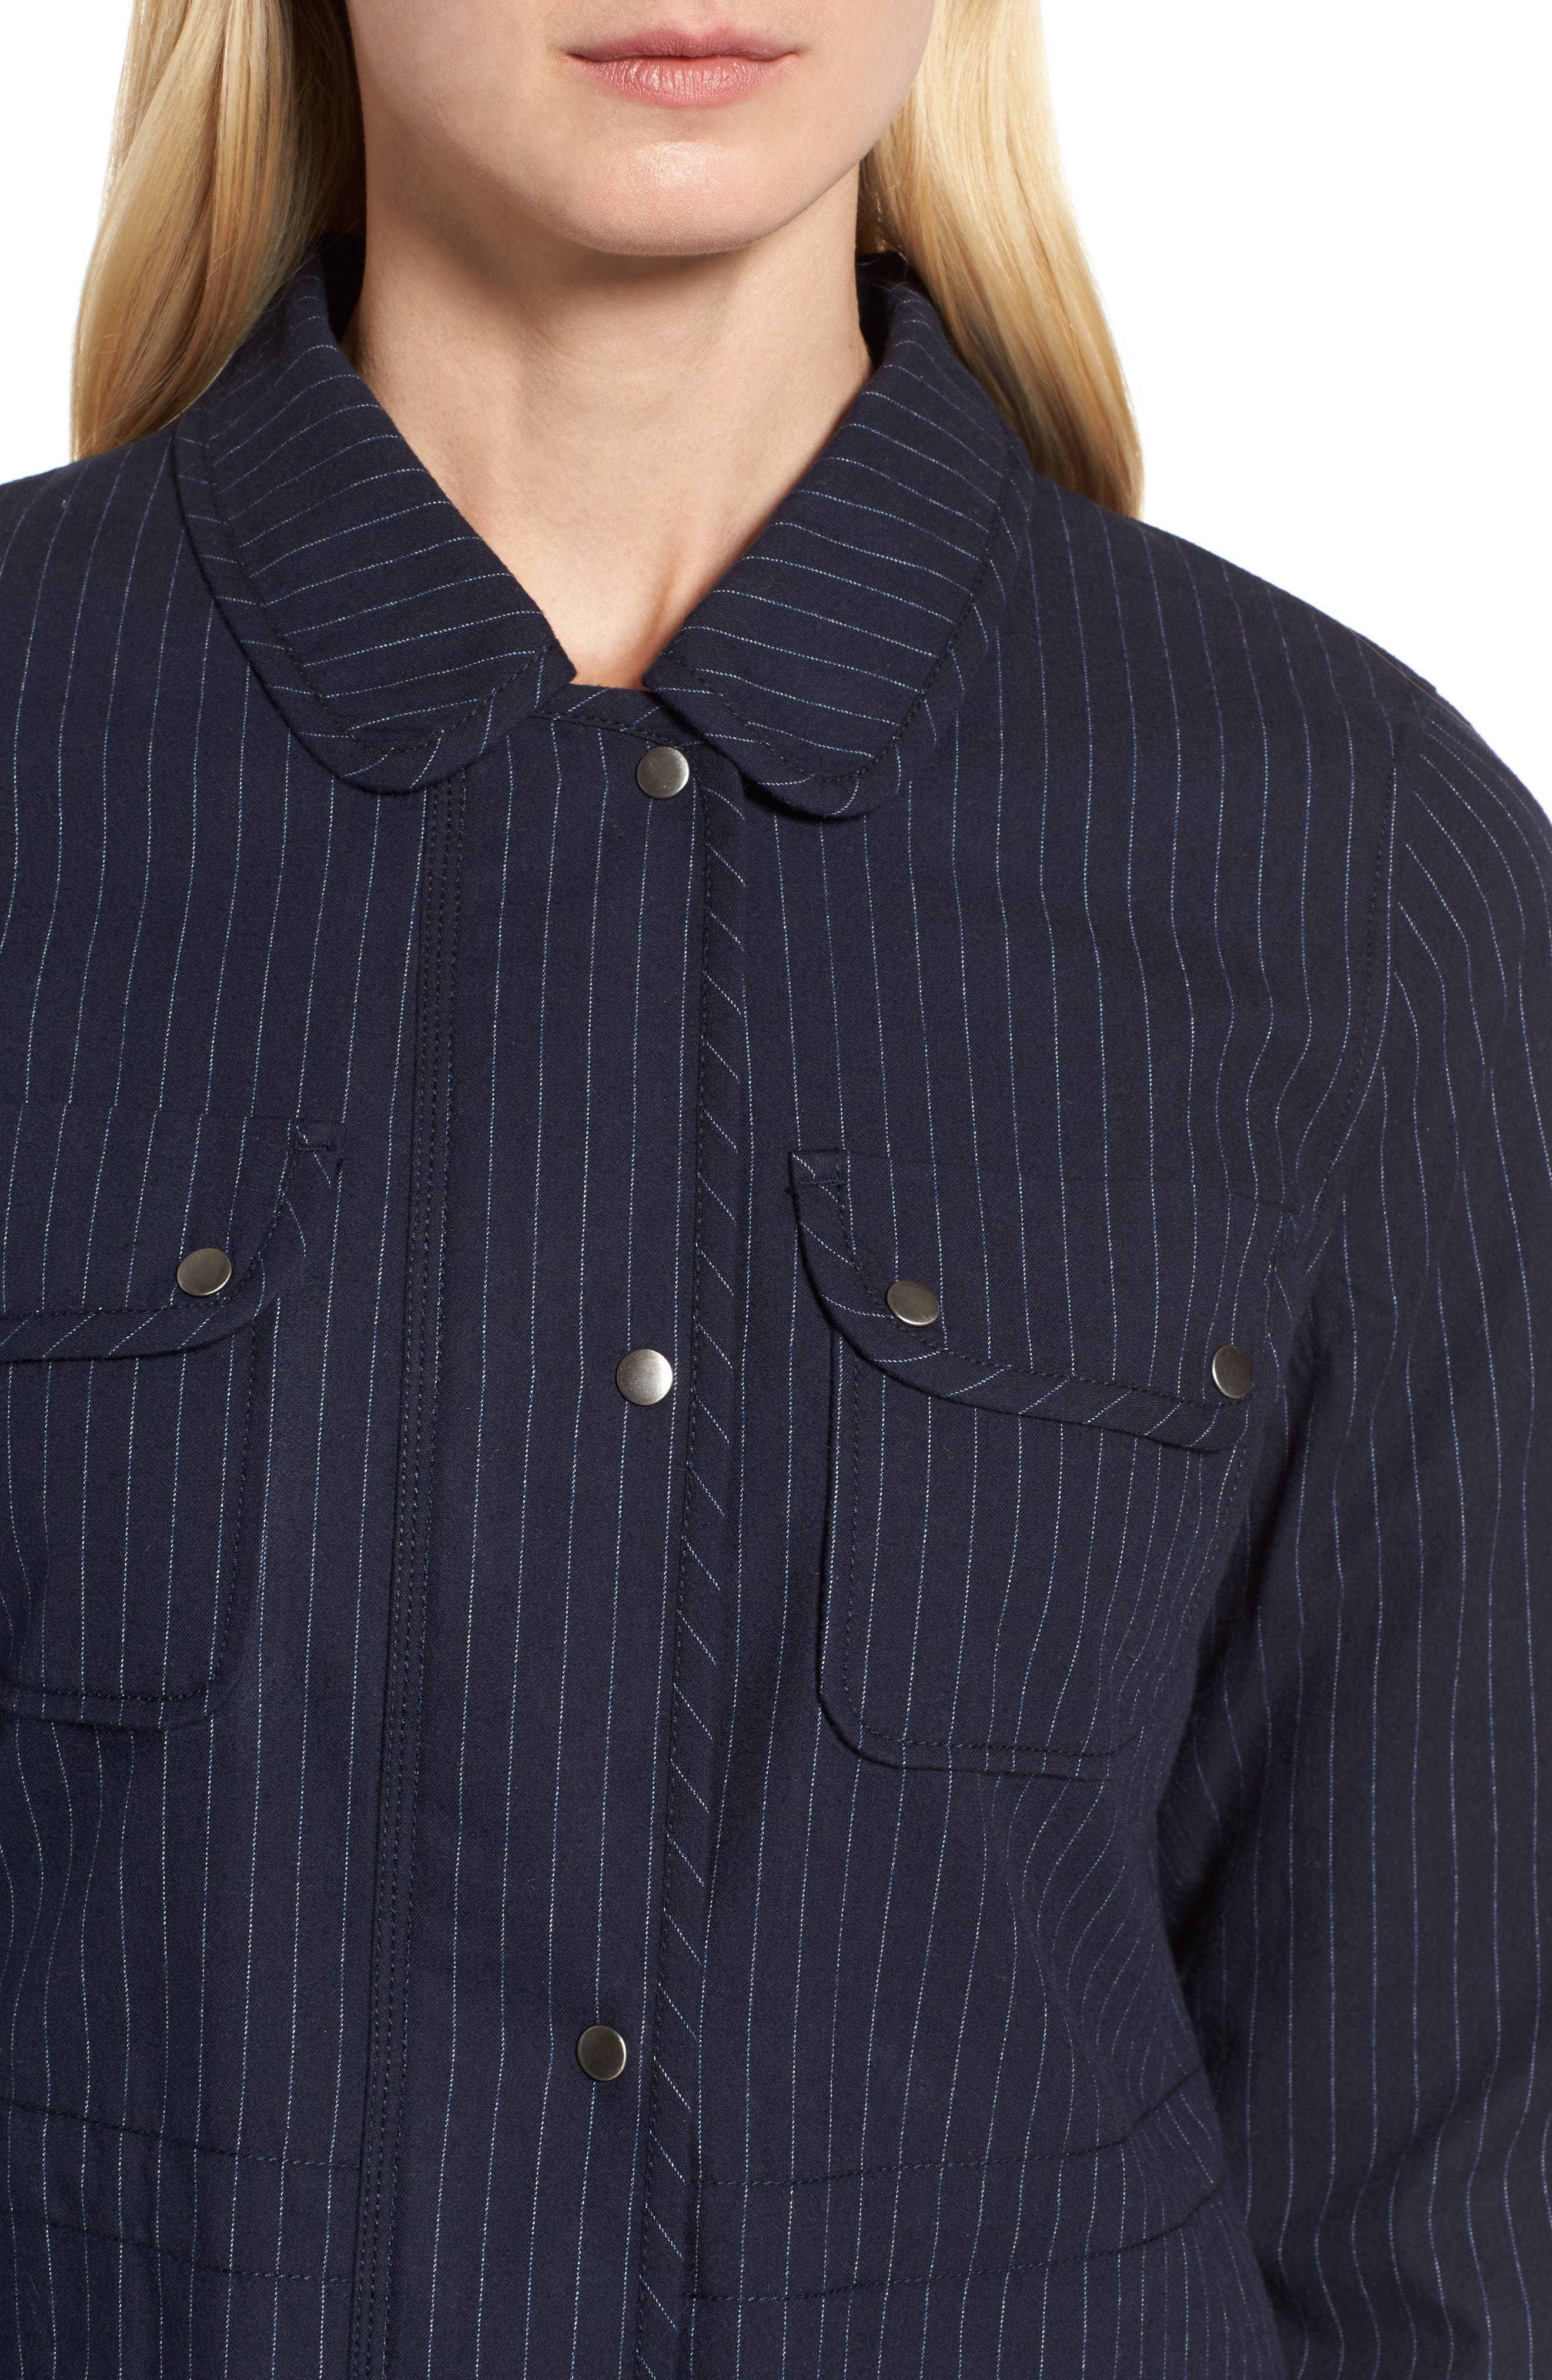 Pinstripe Utility Jacket,                             Alternate thumbnail 4, color,